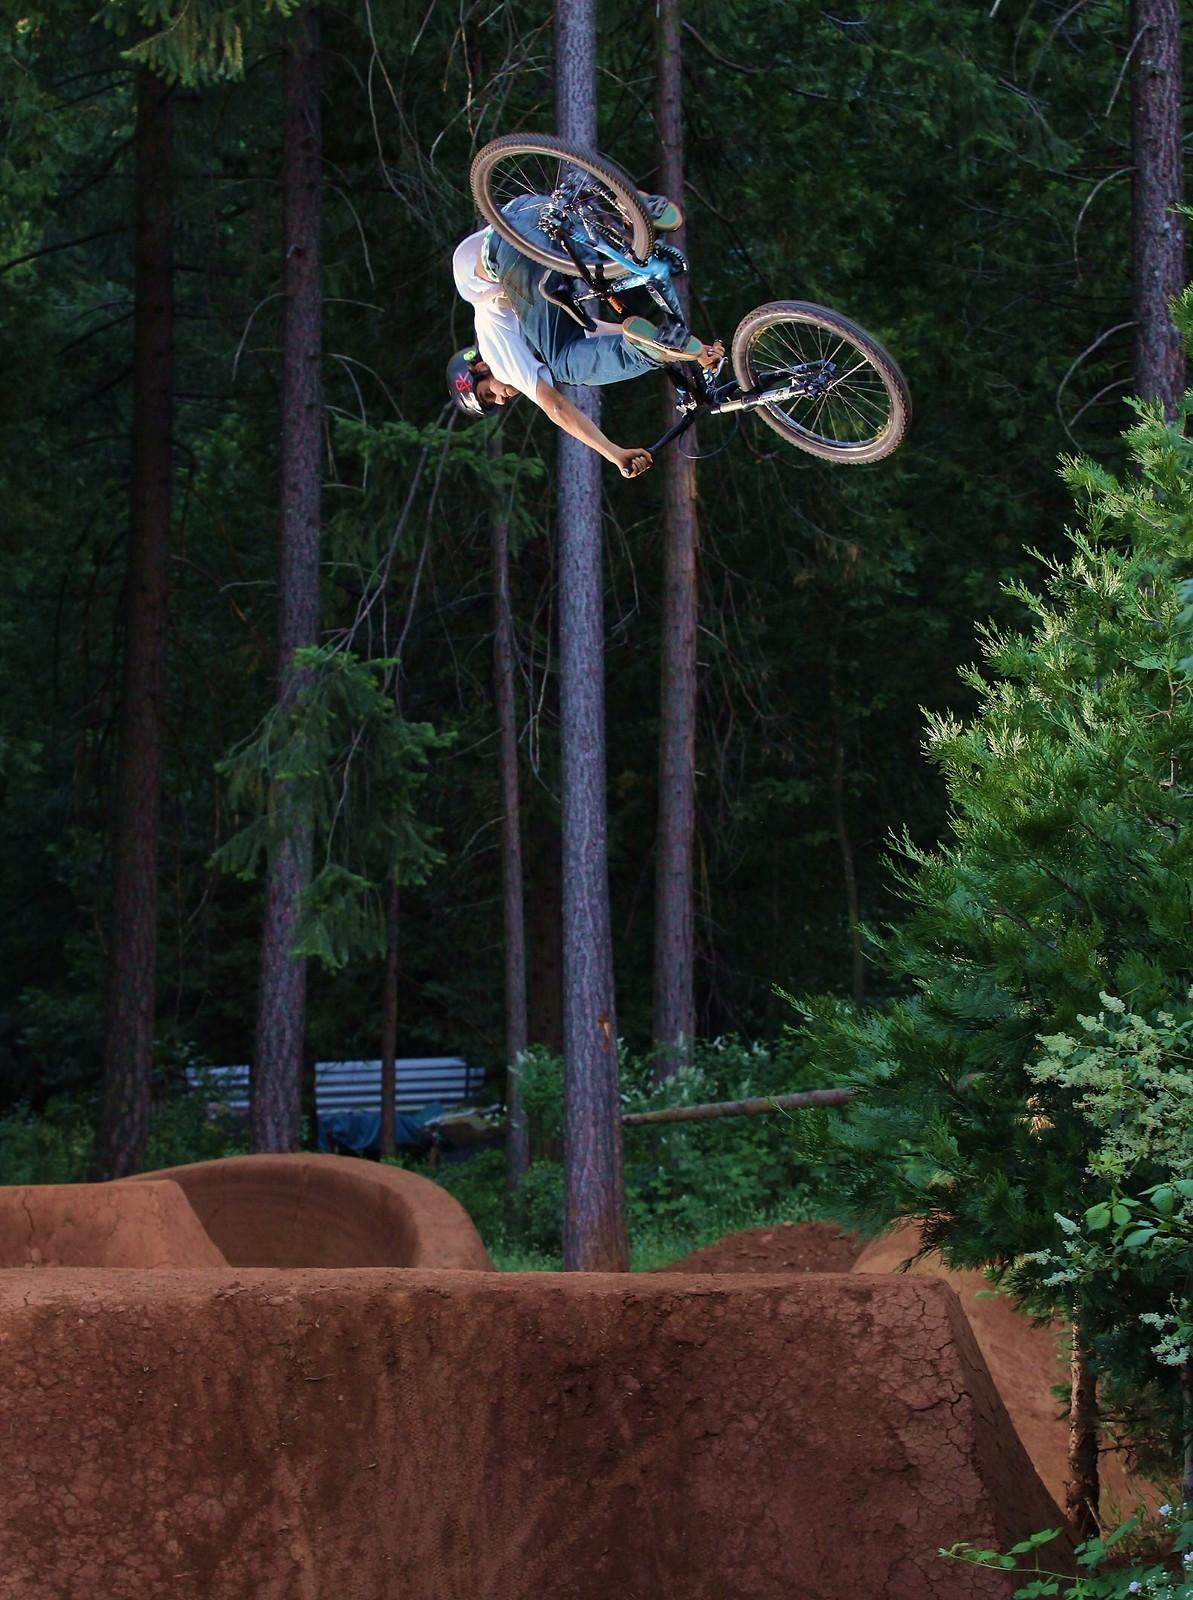 029 - ZD - Mountain Biking Pictures - Vital MTB